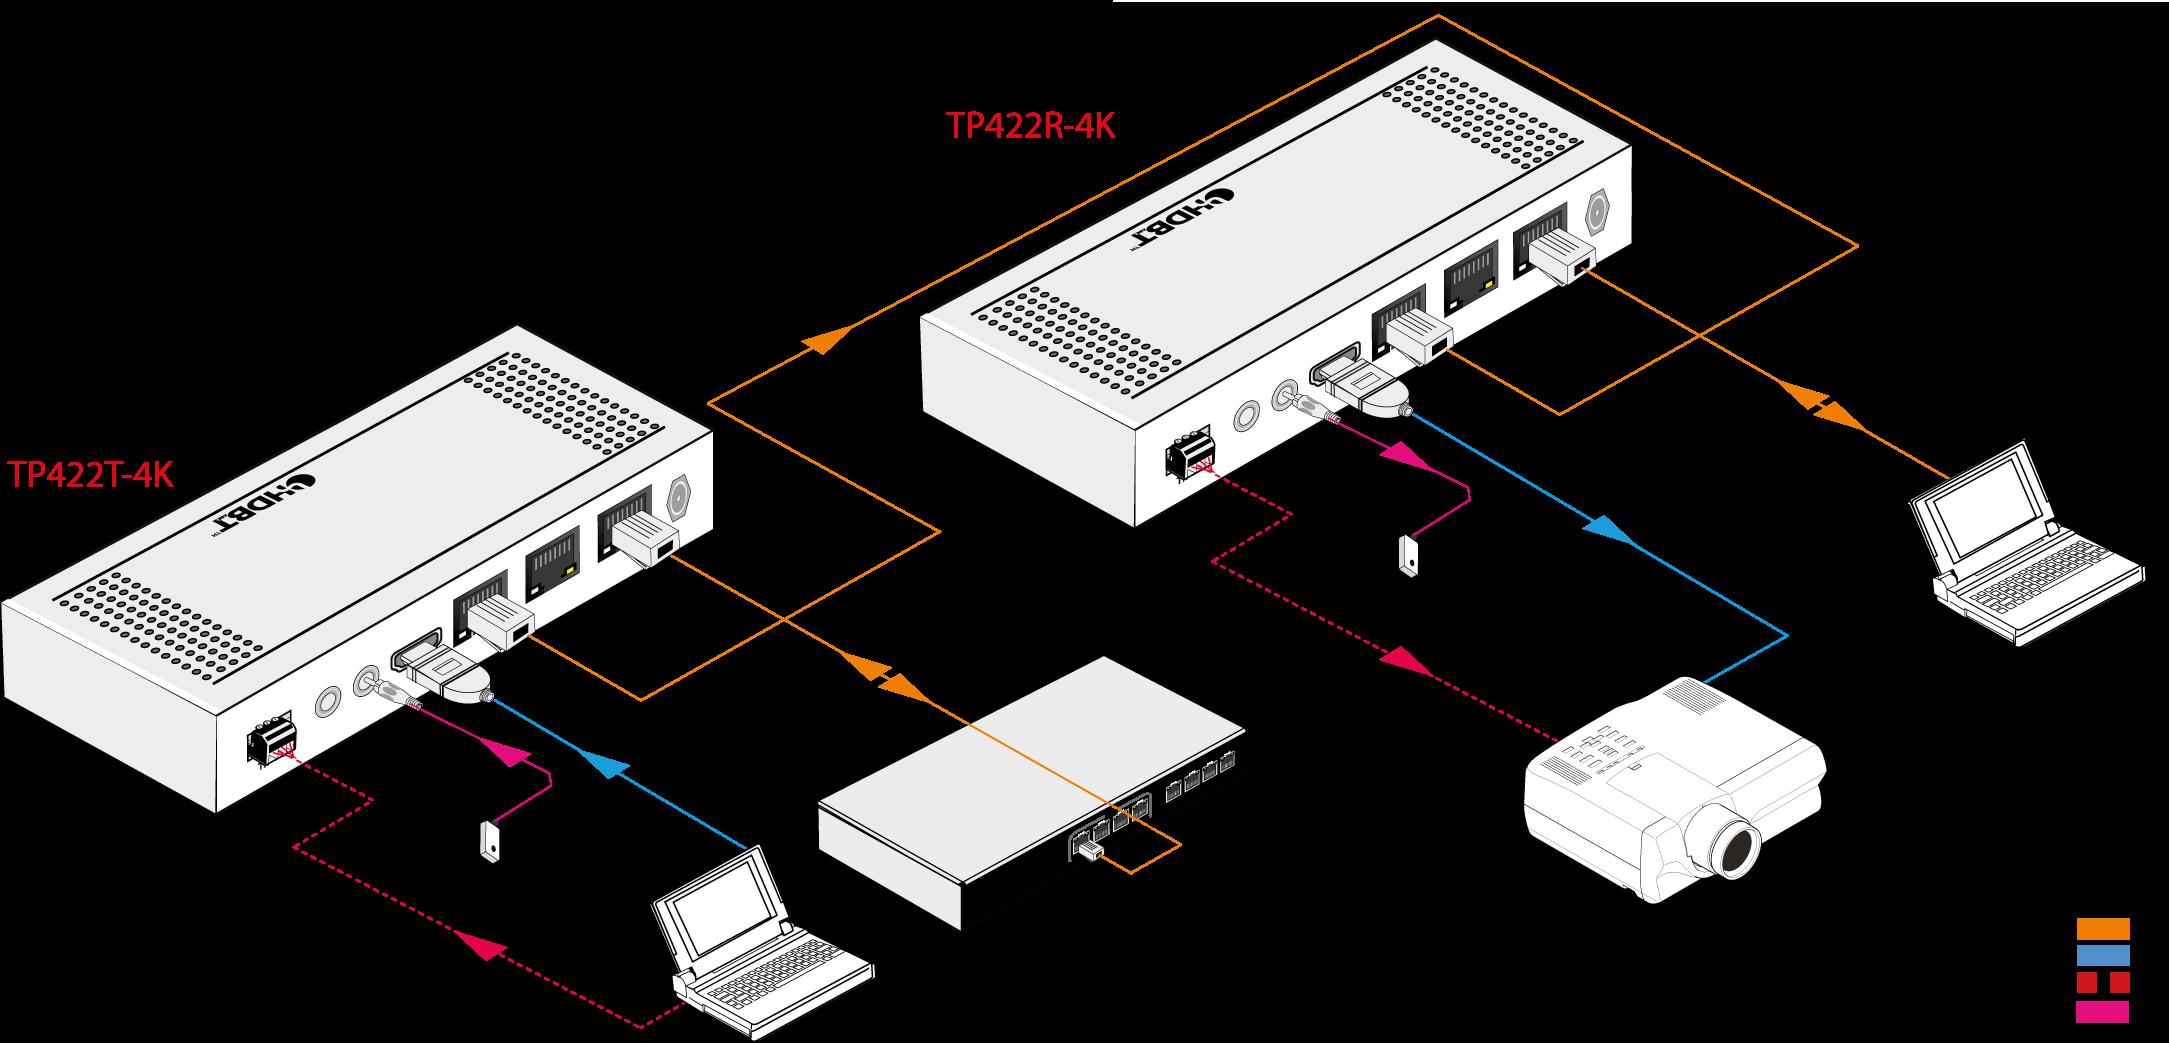 TP422R-4K | Récepteur HDMI HDBaseT 100m avec LAN